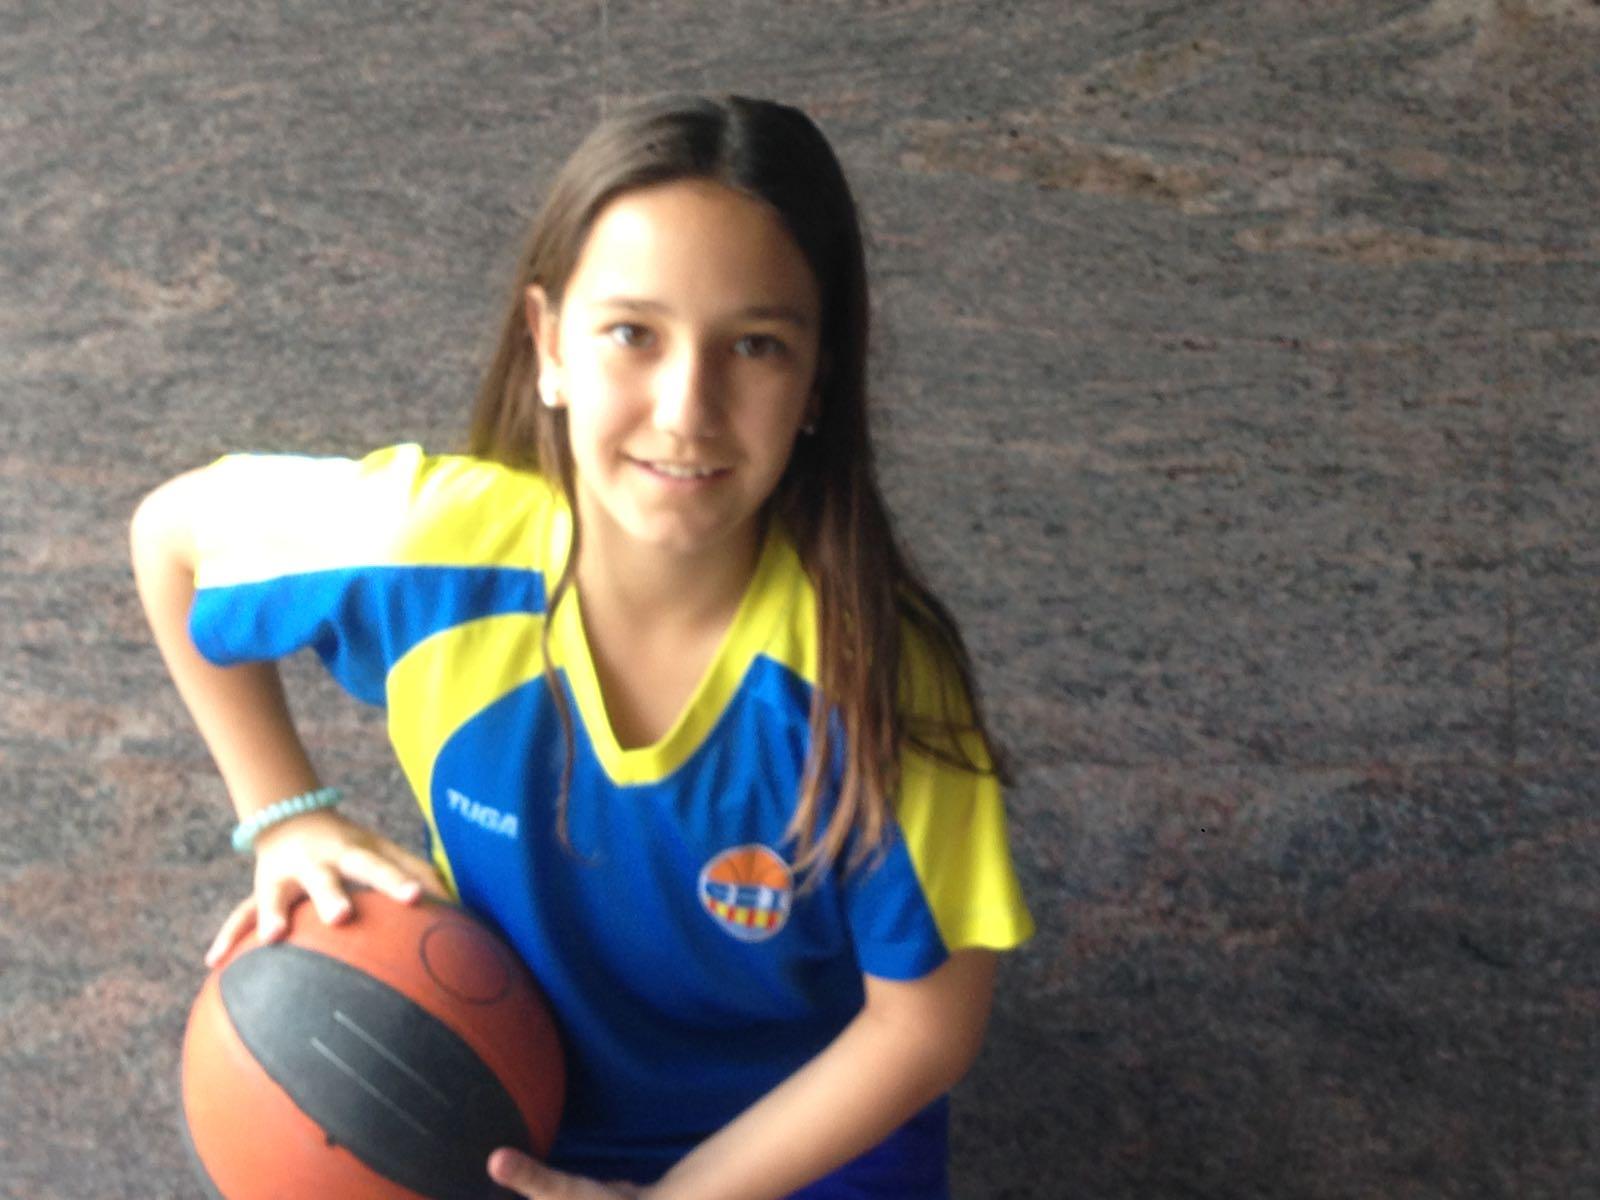 Jana Claramunt, del mini femení Blau, convocada per la FCBQ